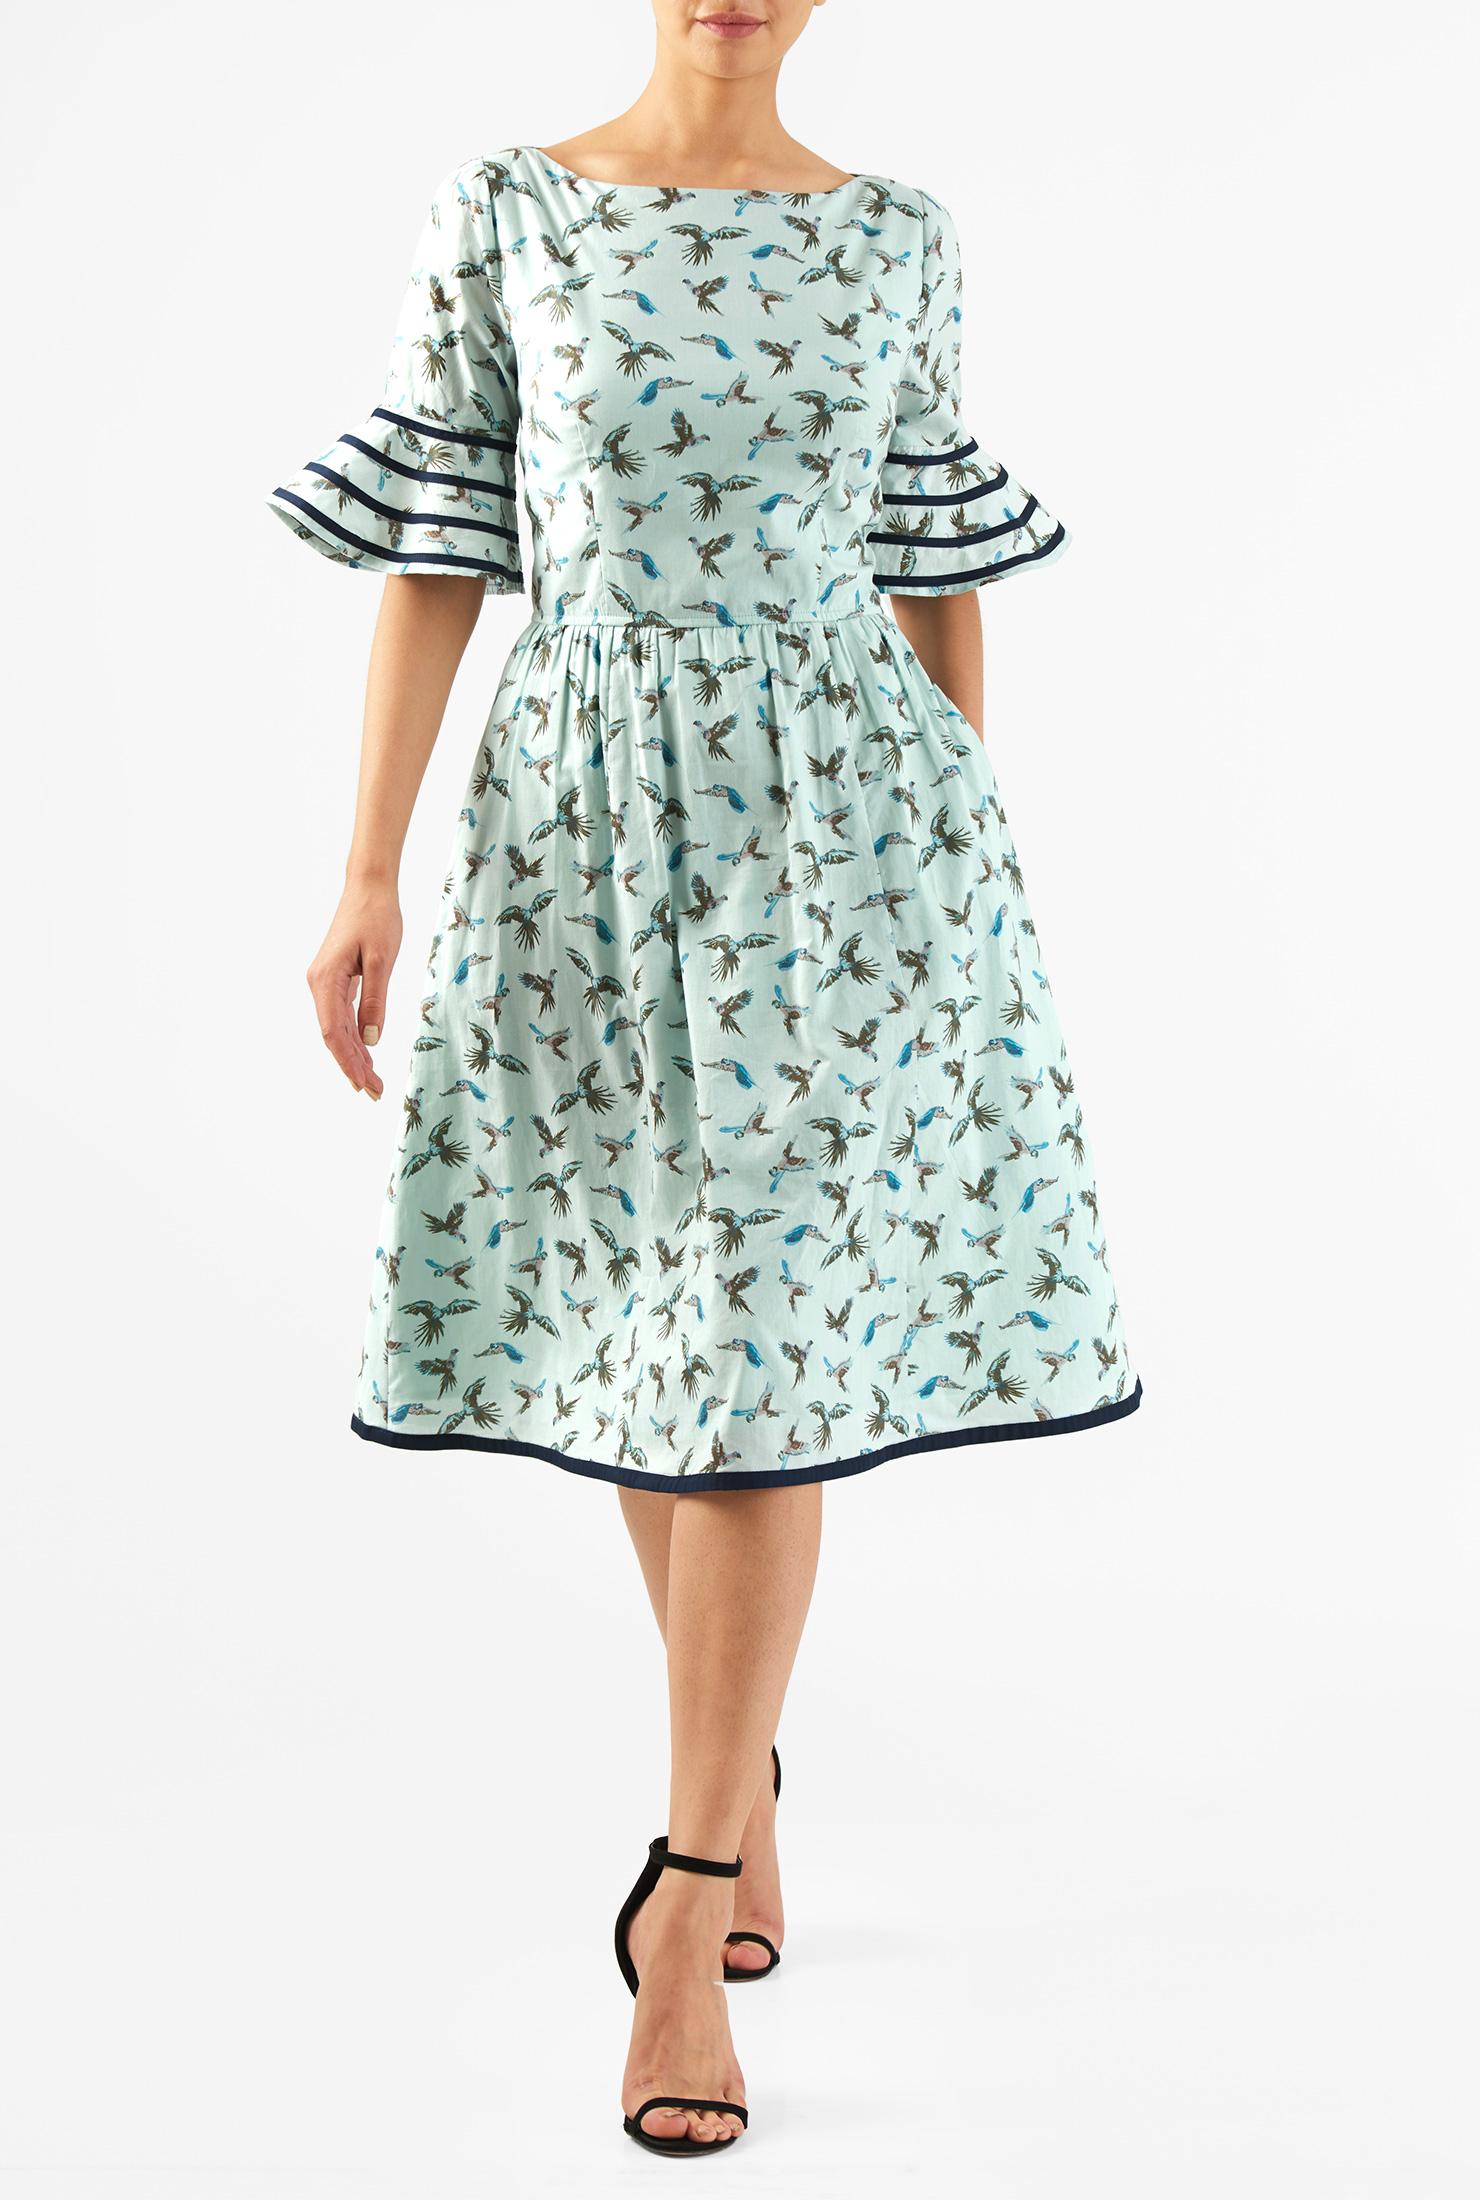 Eshakti Womens Flounce Ruffle Sleeve Bird Print Cotton Dress